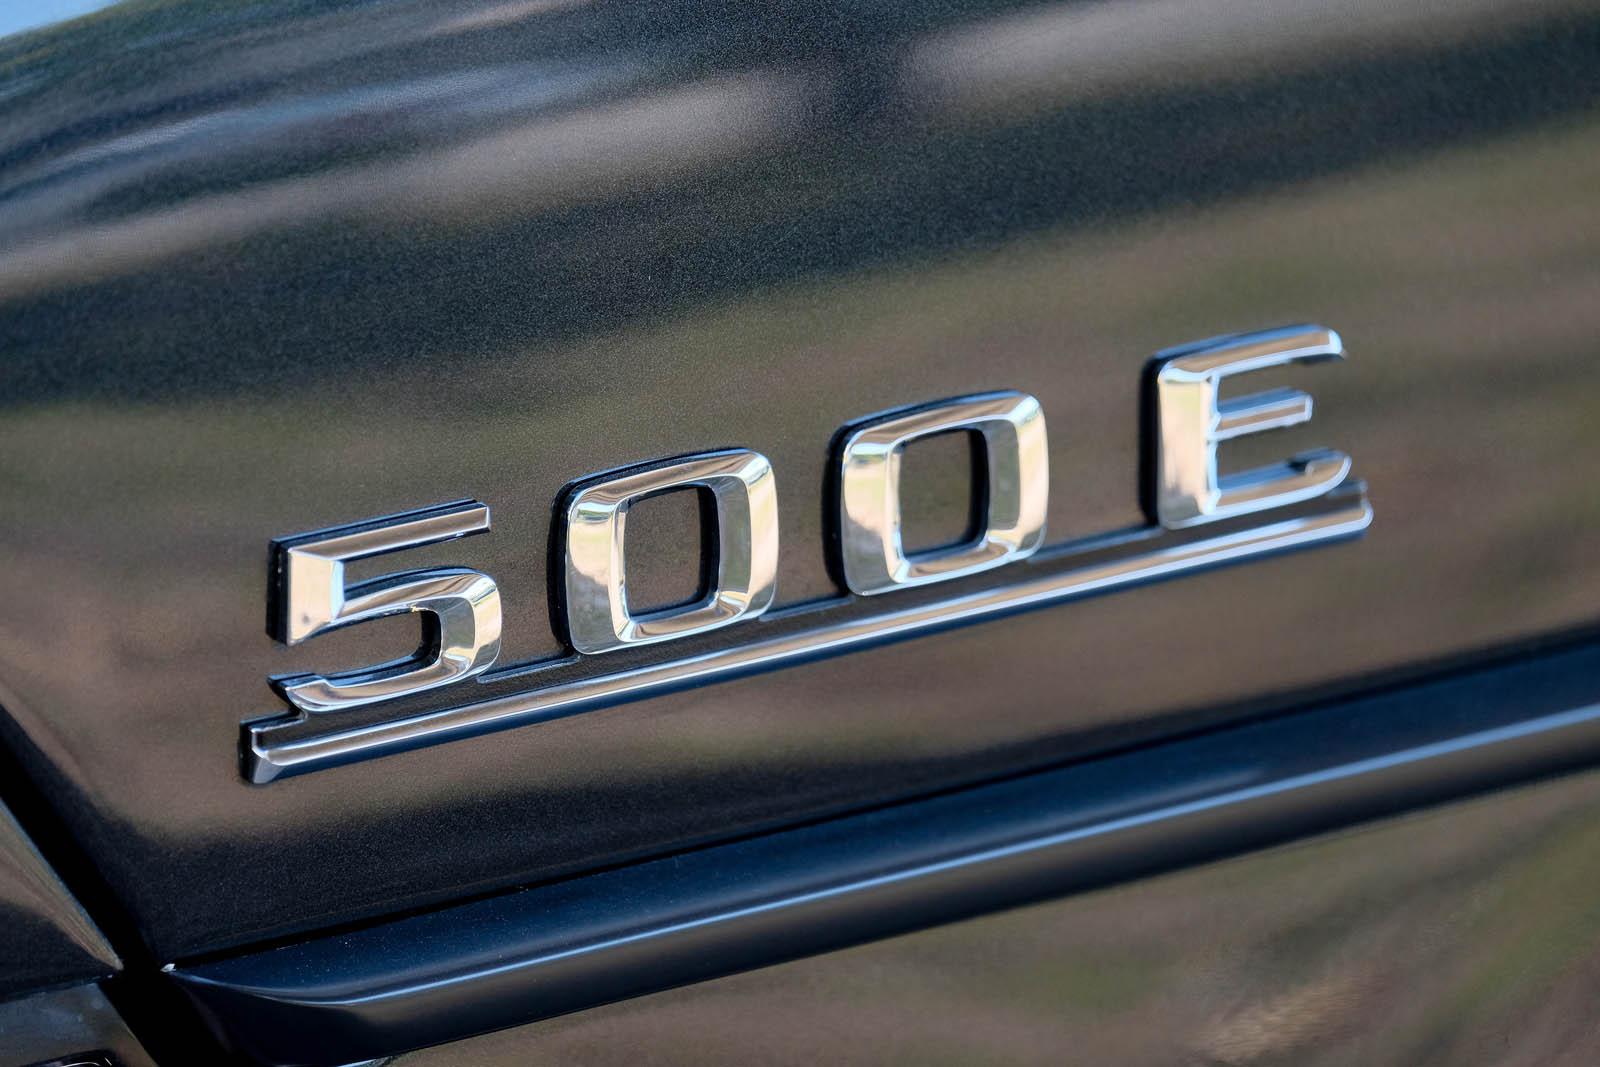 Mercedes-Benz 500E lettering